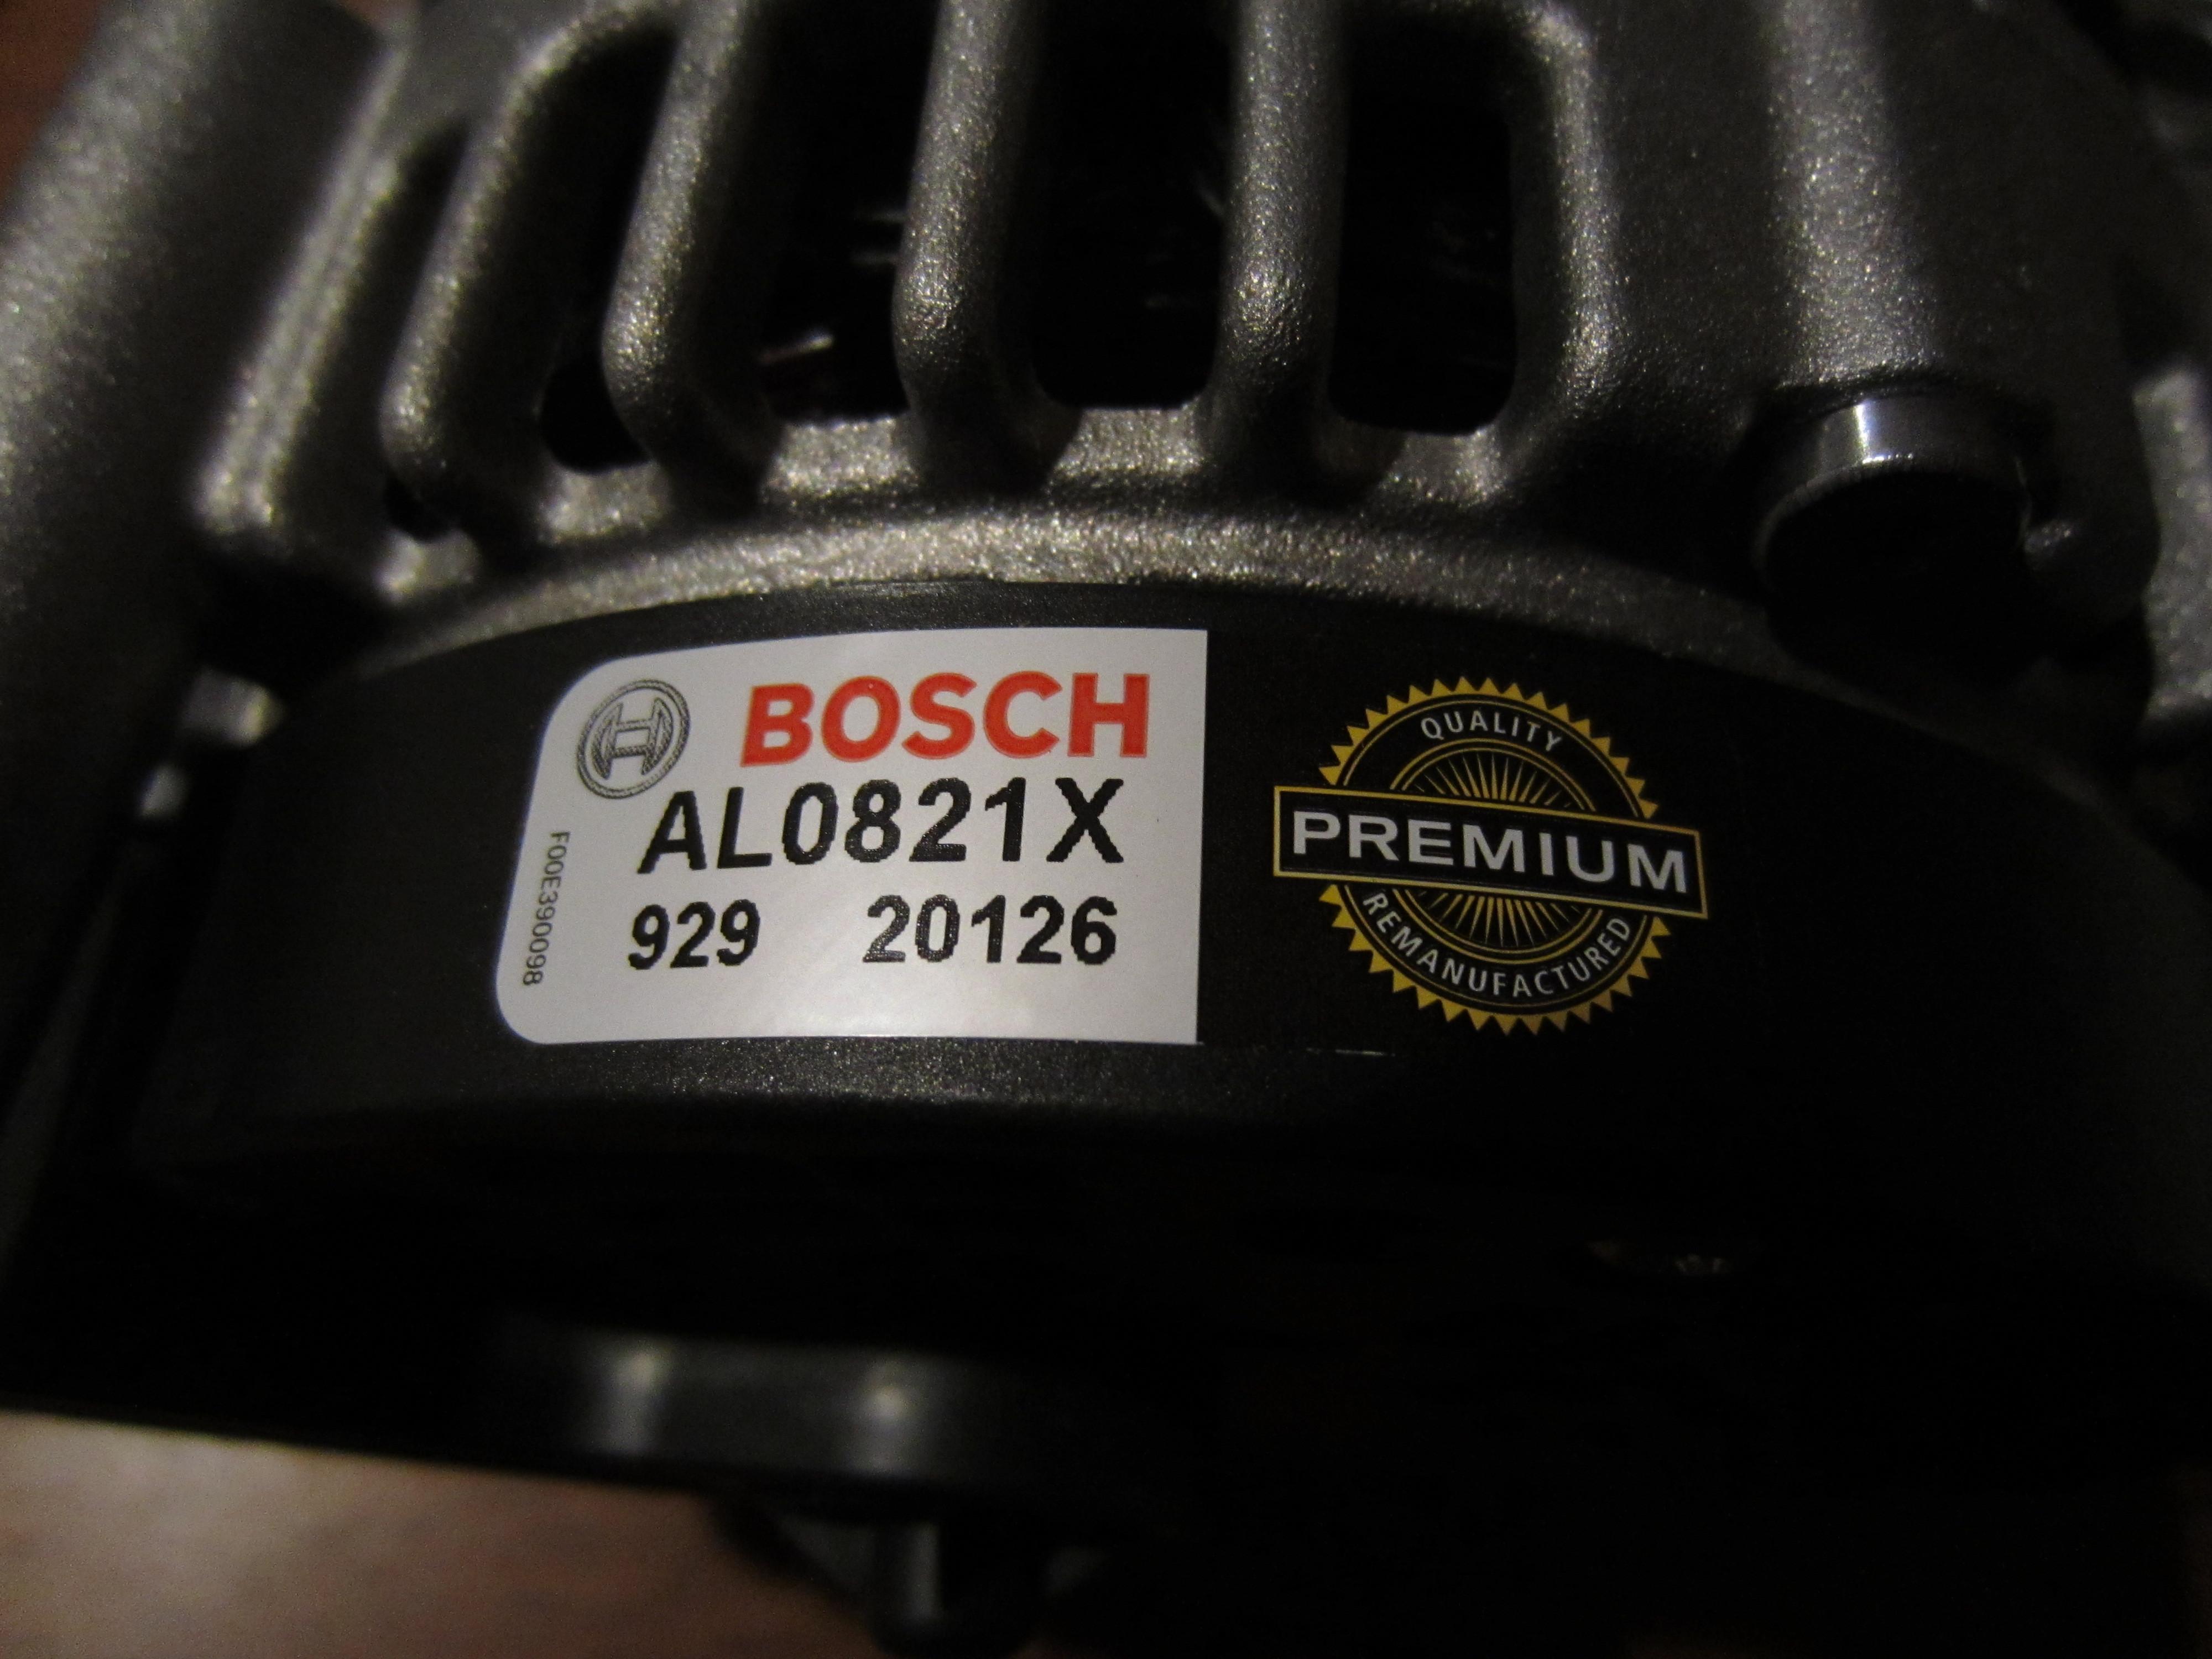 Volvo 850 Alternator Replacement - Thread Tutorial Xc V Replacing The Alternator - Volvo 850 Alternator Replacement